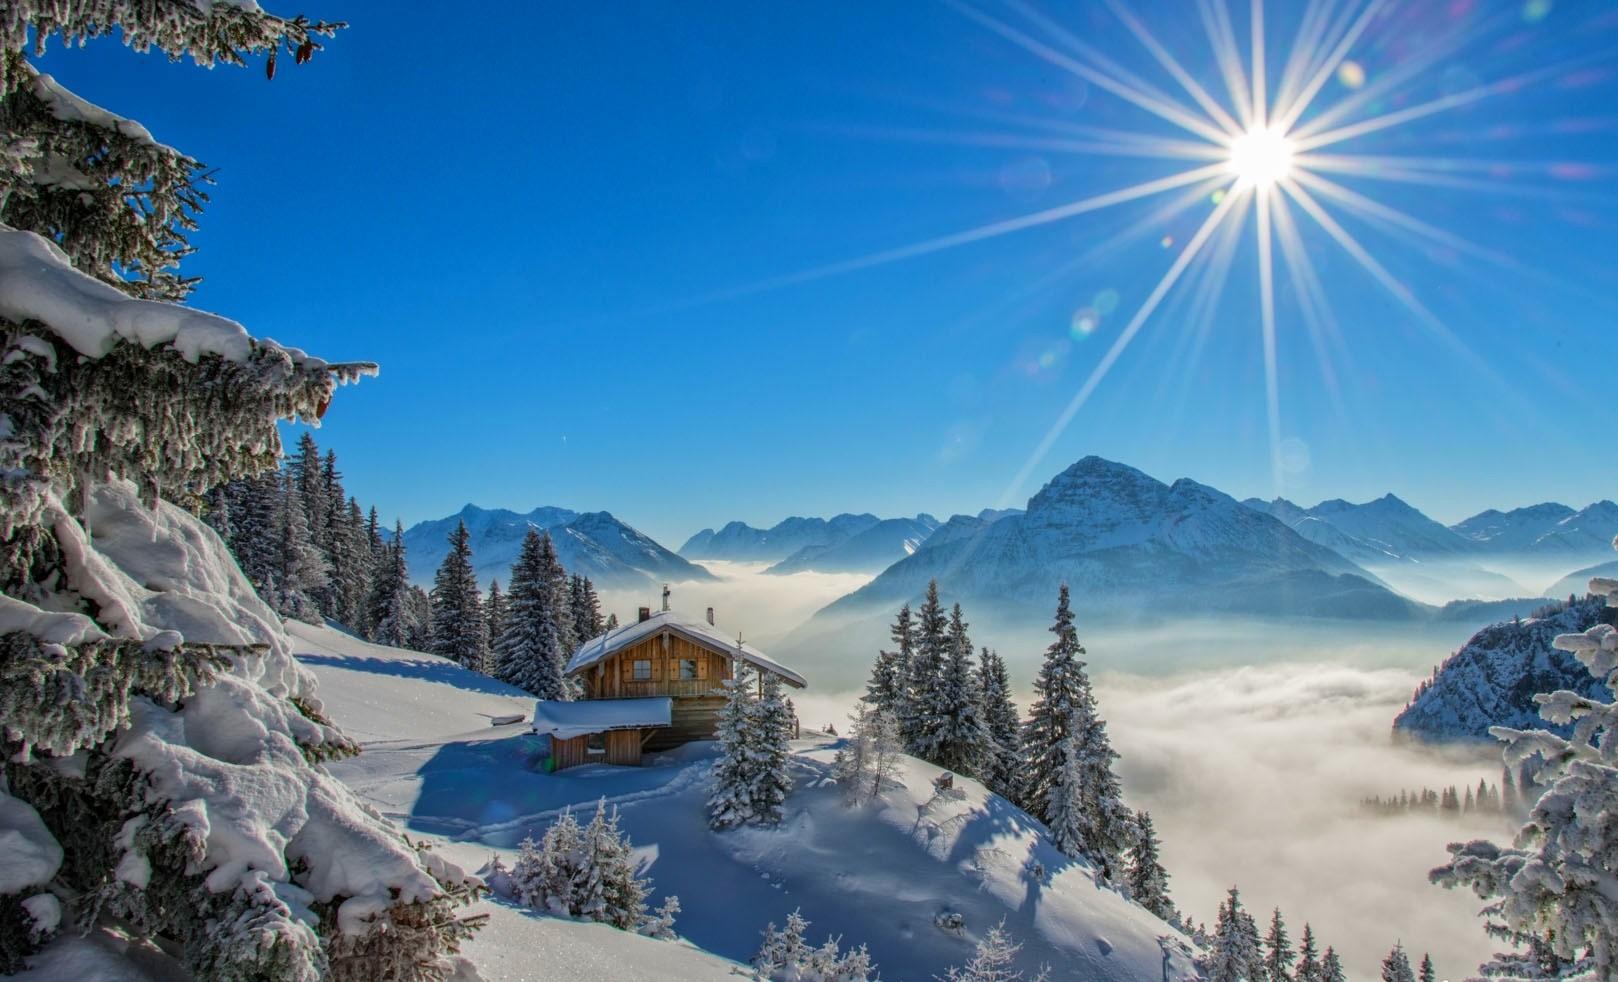 fond d 39 cran paysage for t montagnes la nature neige hiver bleu pic enneig rayons de. Black Bedroom Furniture Sets. Home Design Ideas